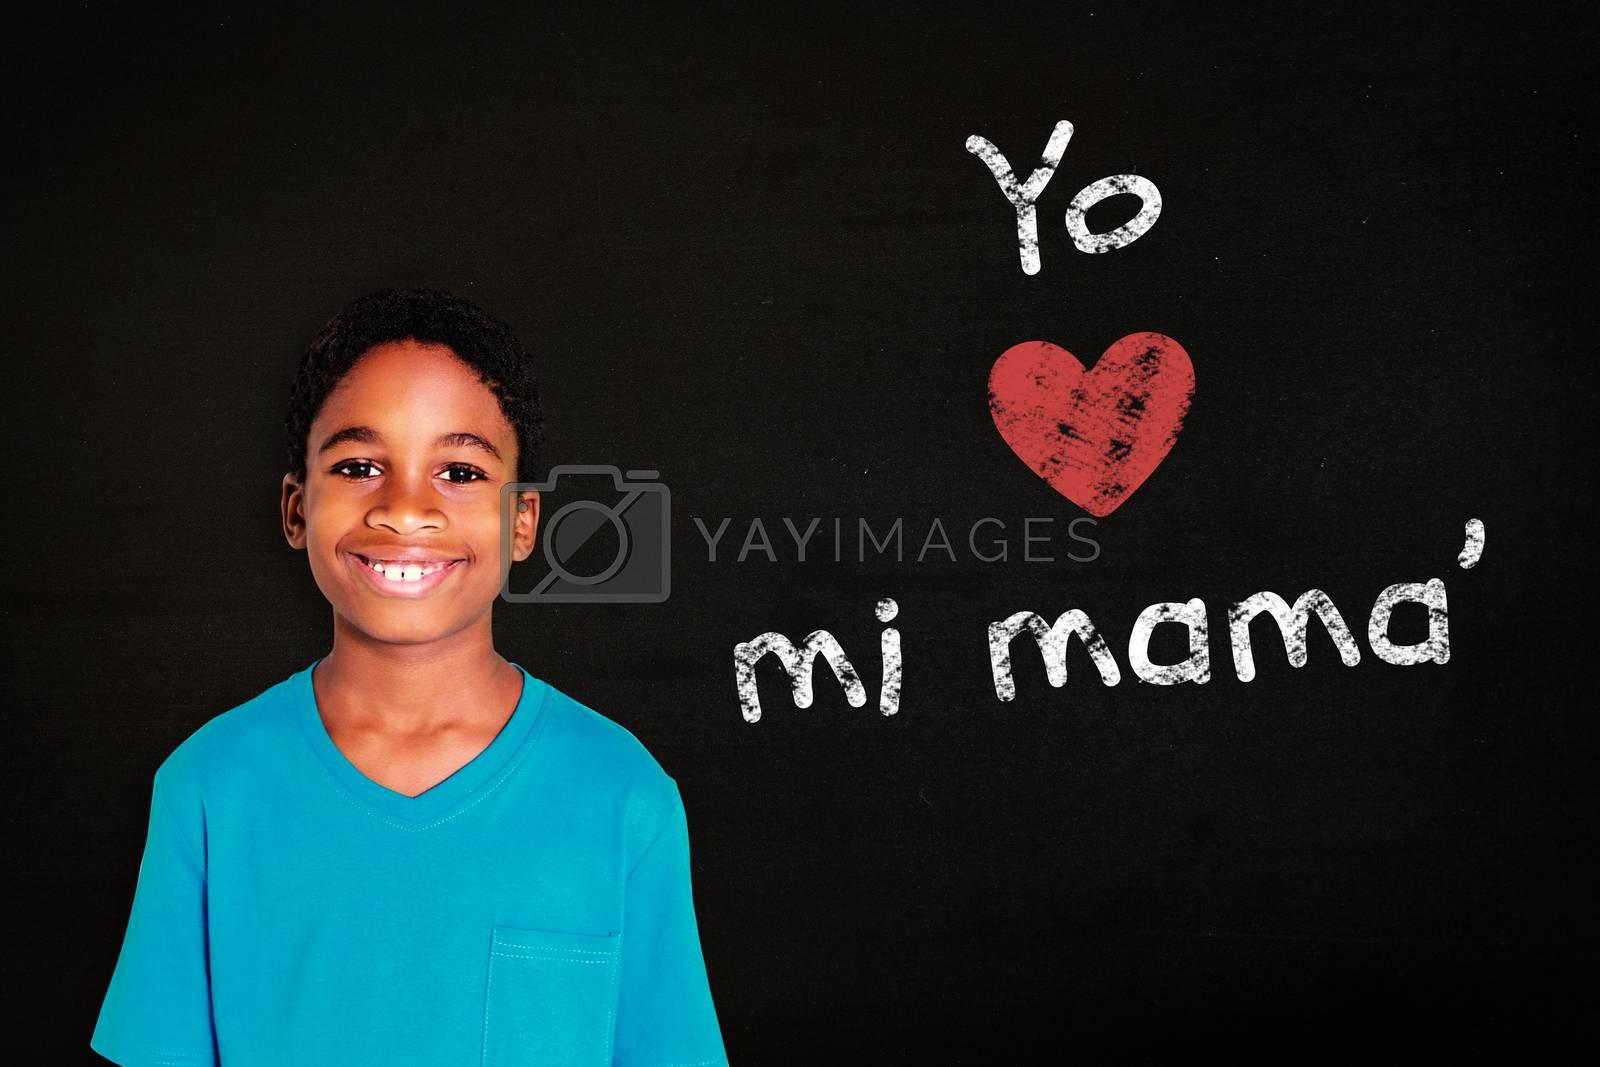 Cute boy smiling at camera against black